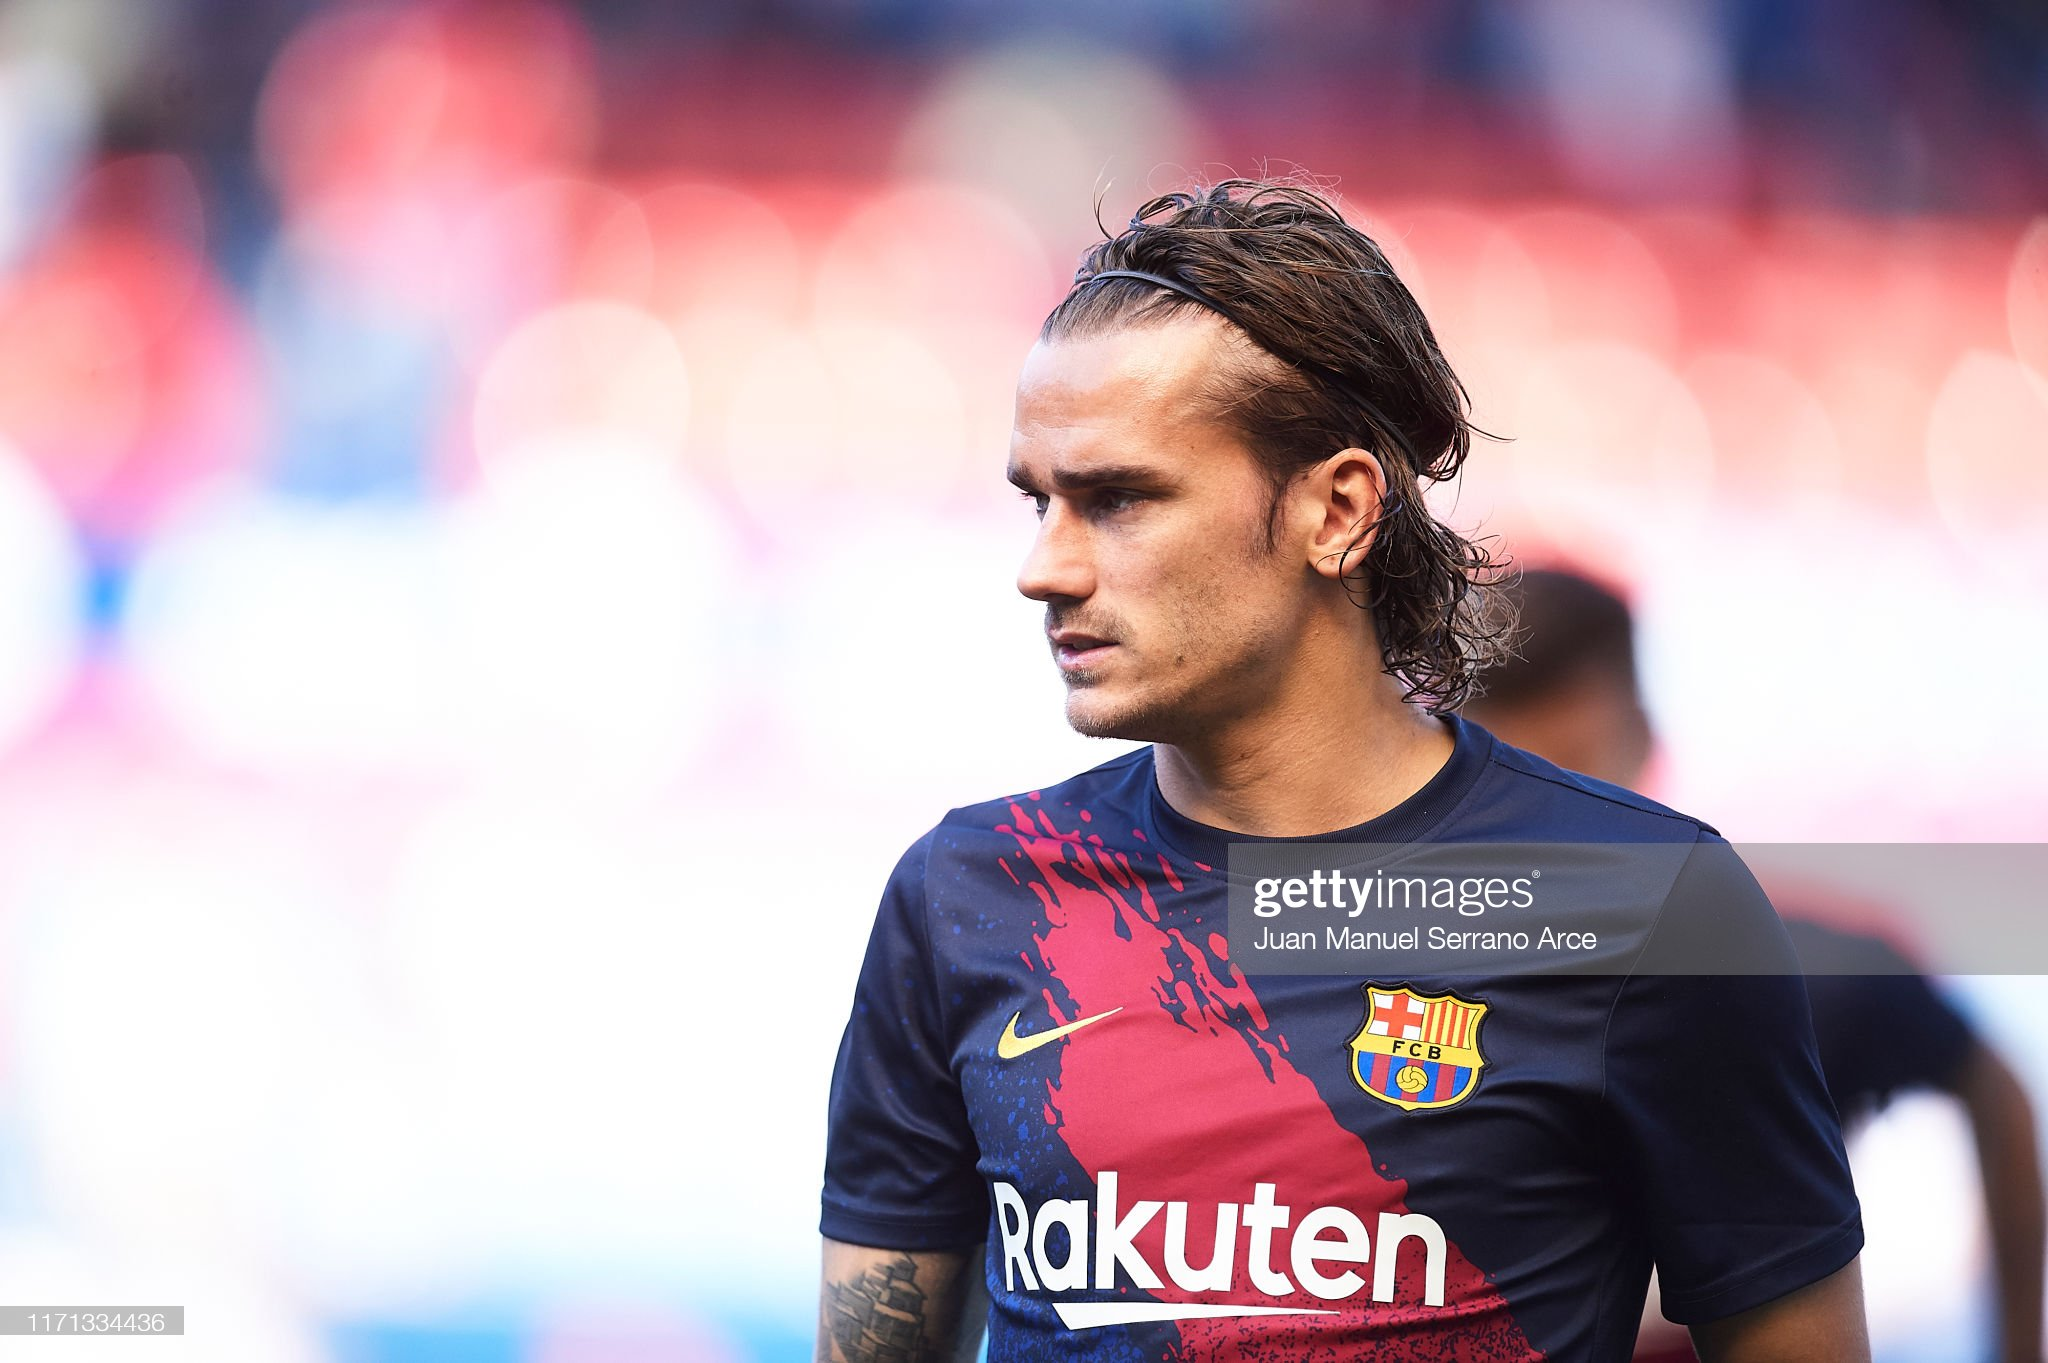 صور مباراة : أوساسونا - برشلونة 2-2 ( 31-08-2019 )  Antoine-griezmann-of-fc-barcelona-looks-on-during-the-warm-up-prior-picture-id1171334436?s=2048x2048